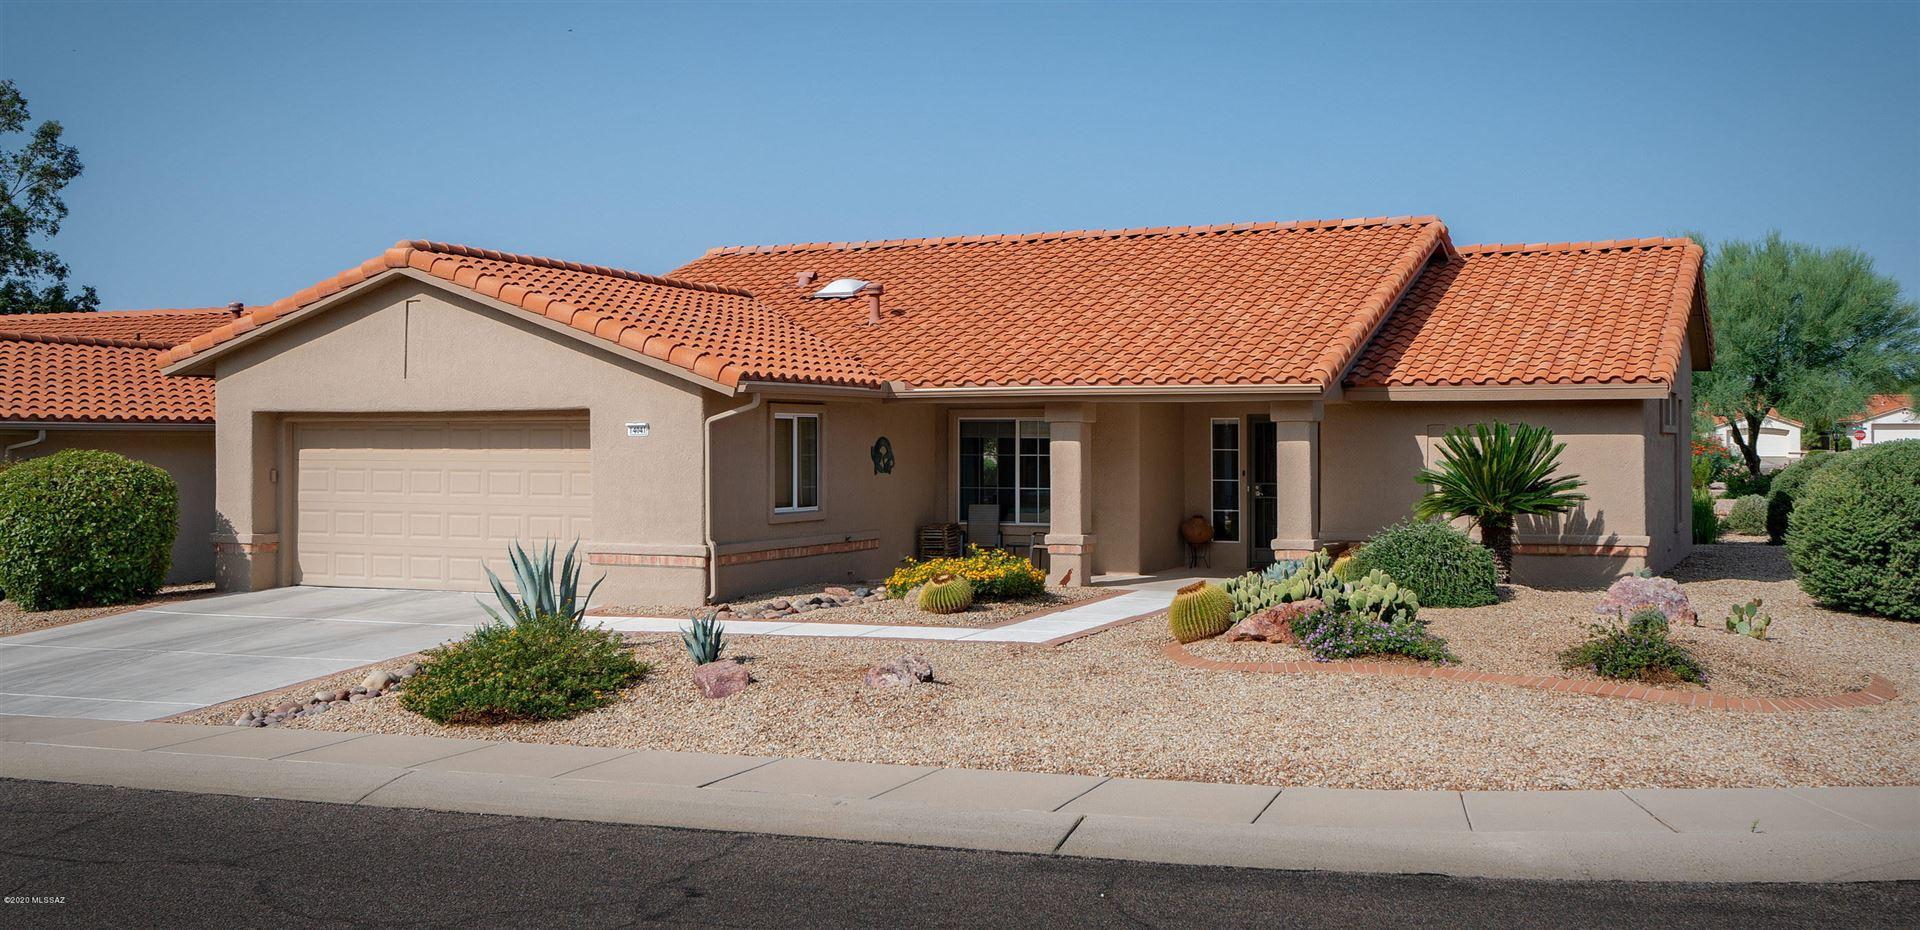 14041 N Lobelia Way, Oro Valley, AZ 85755 - MLS#: 22023147